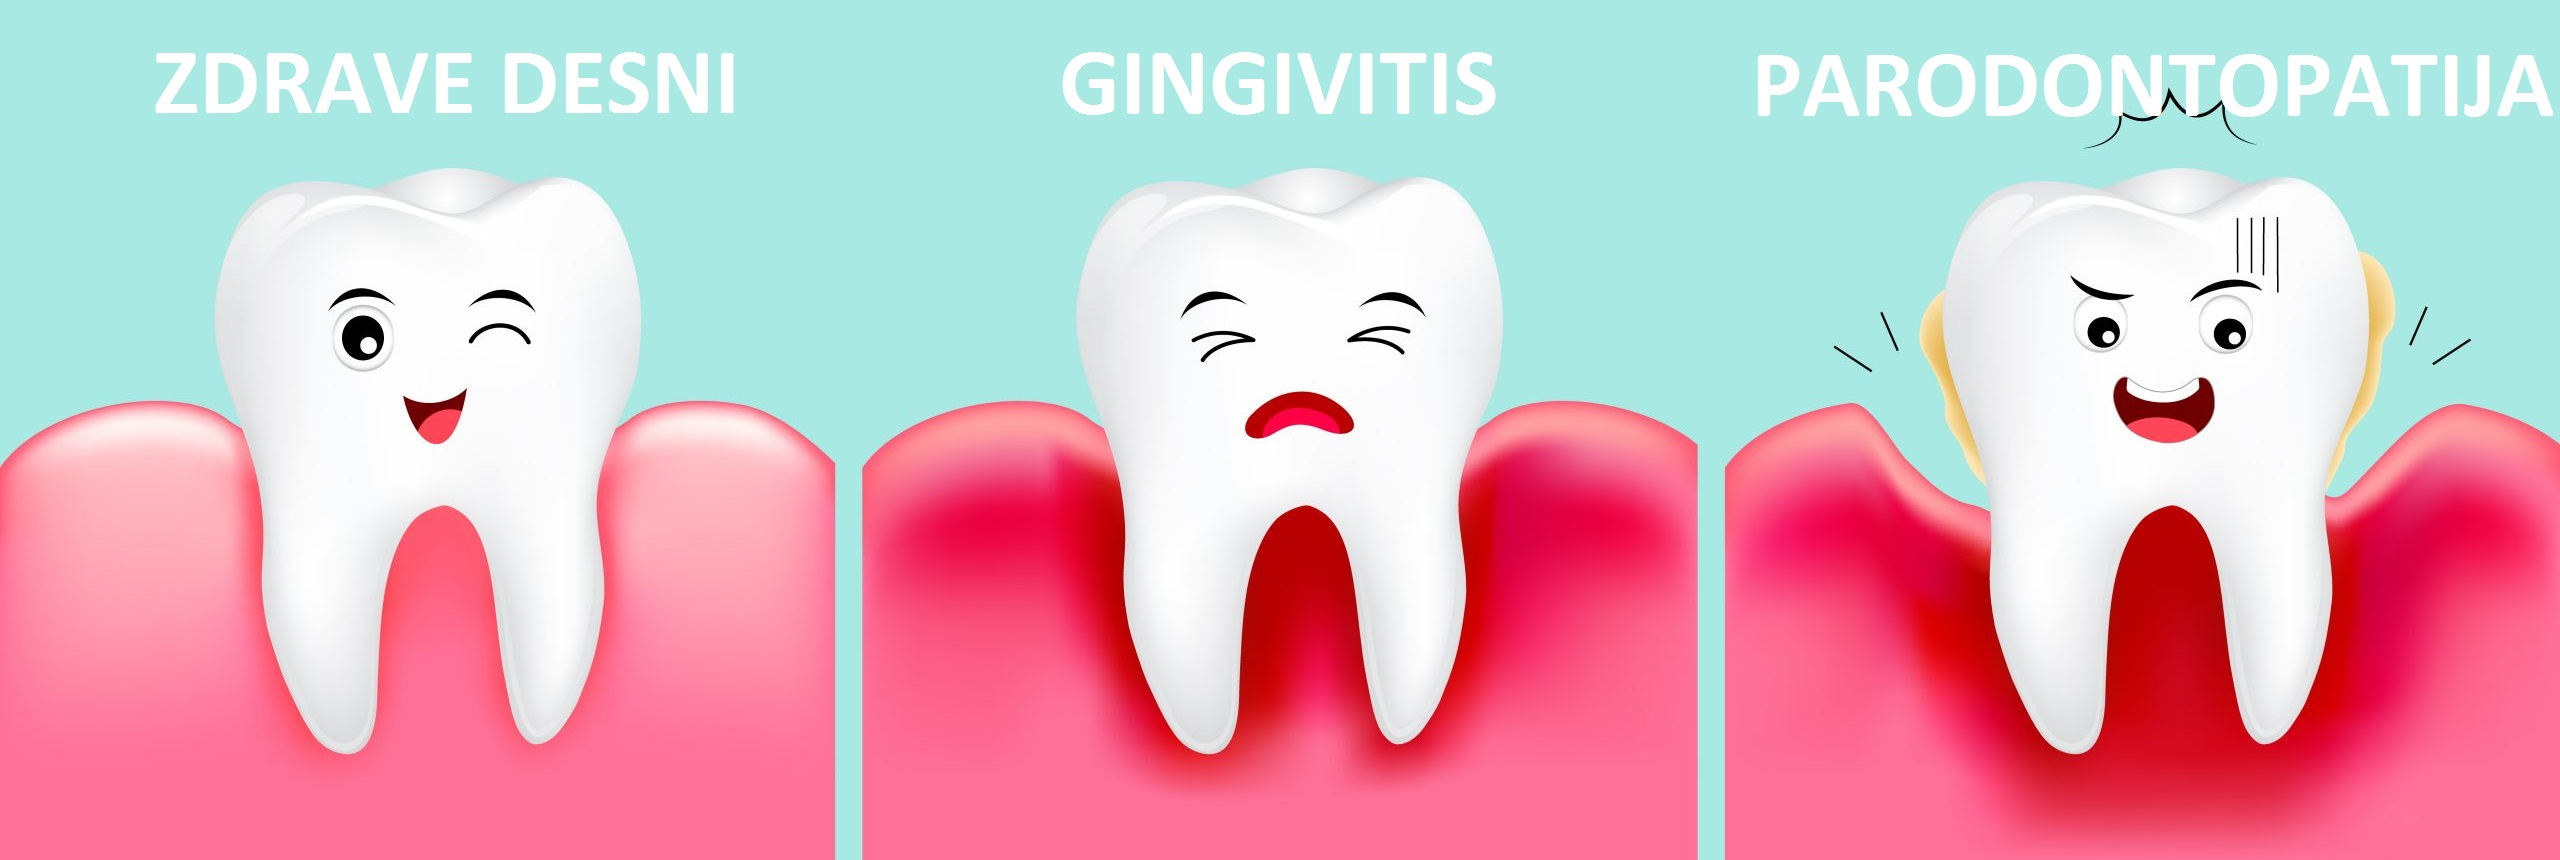 Gingivitis i parodontopatija